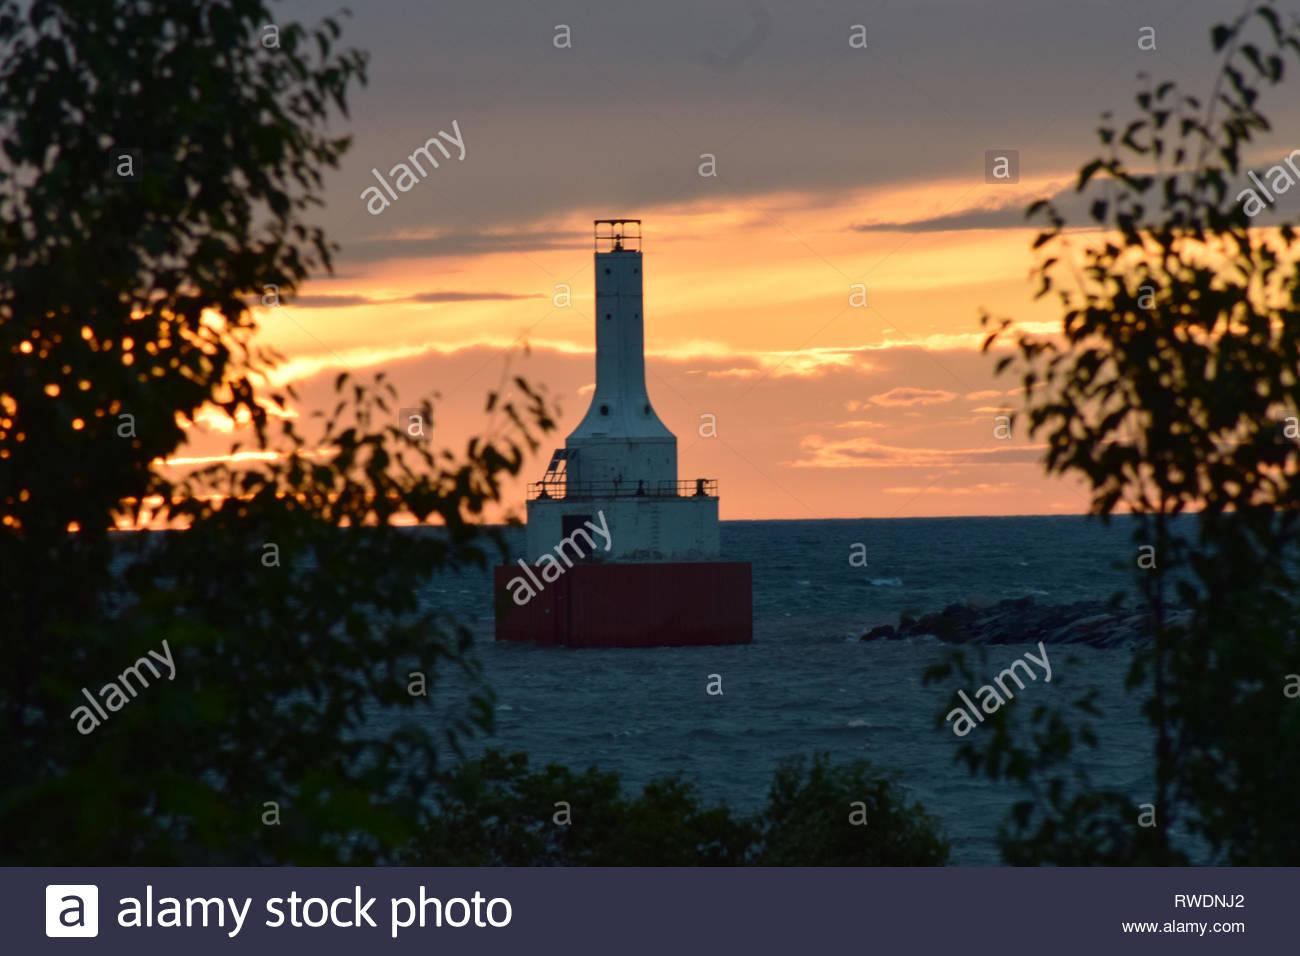 Portage Lake Upper Entry Lighthouse - Stock Image